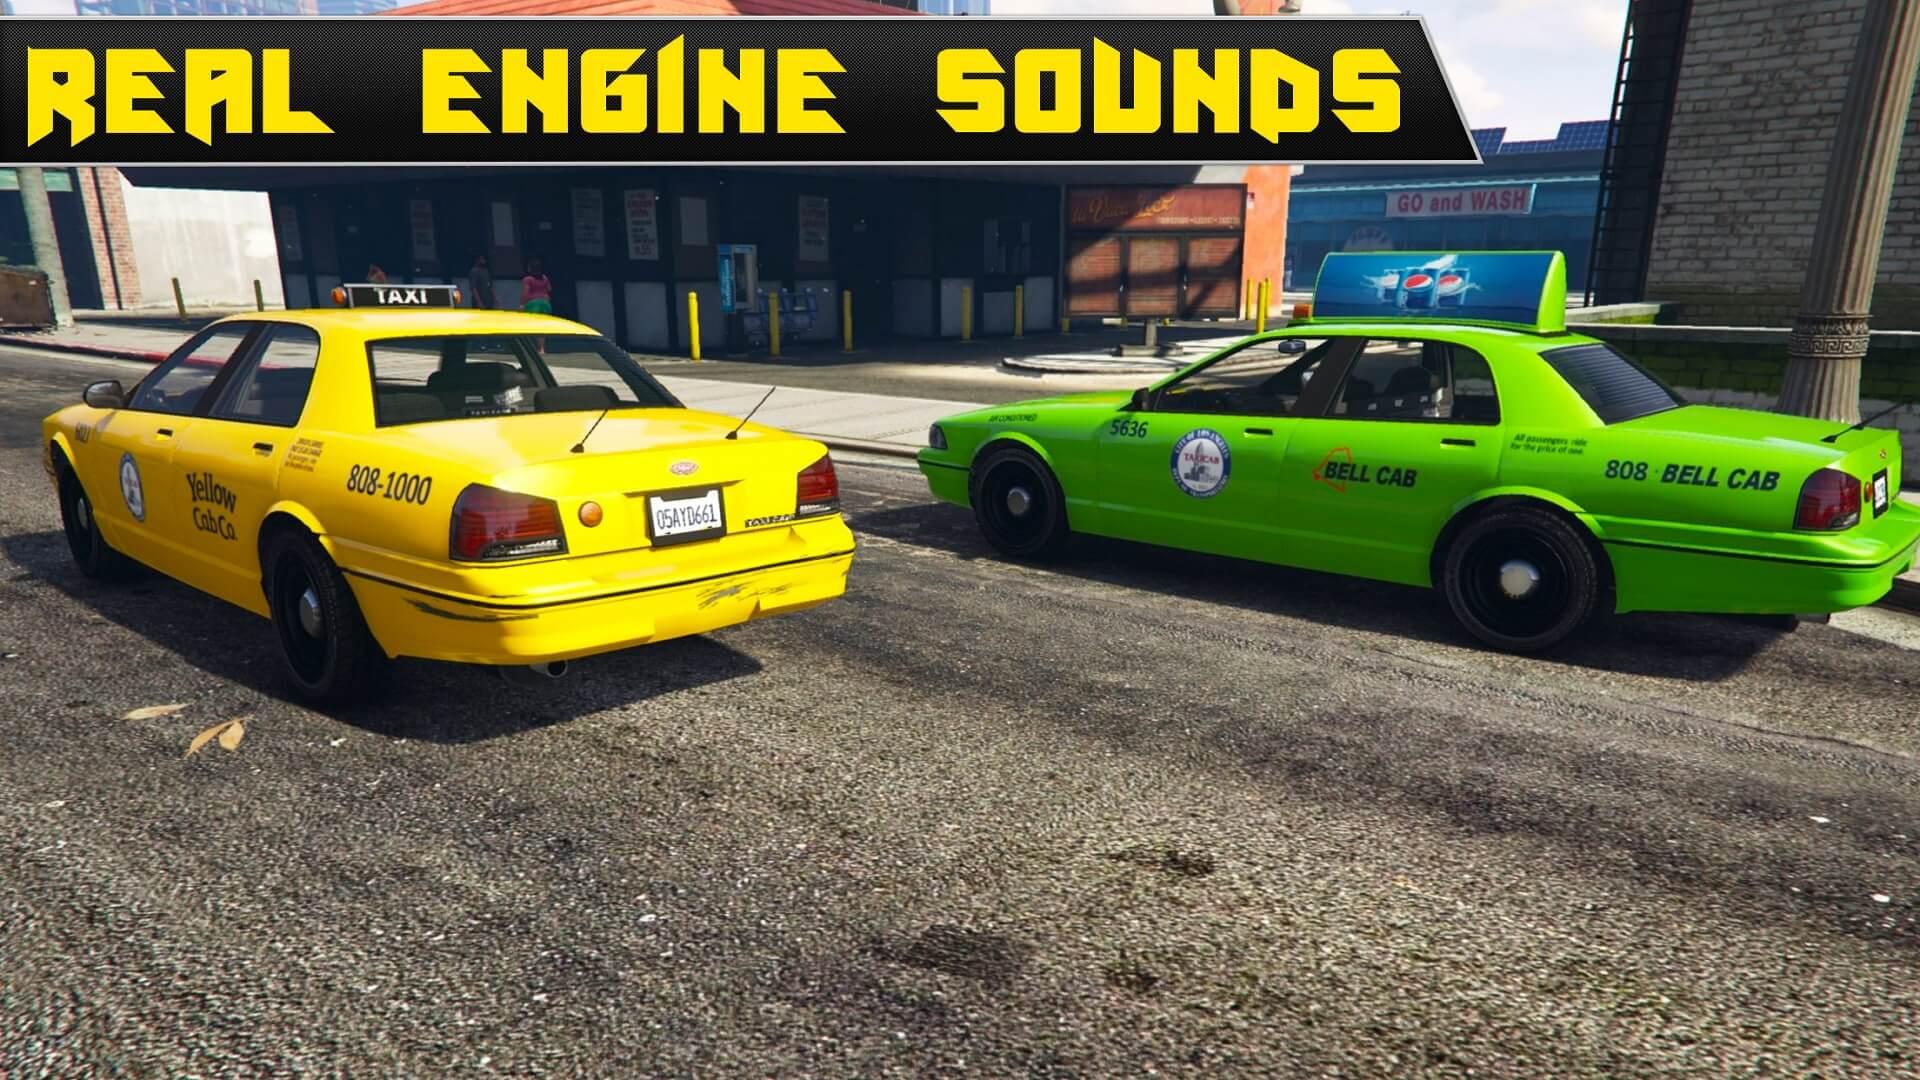 Crazy Taxi Simulator – Cab Sim Modern Taxi Game 64 Bit Source Code